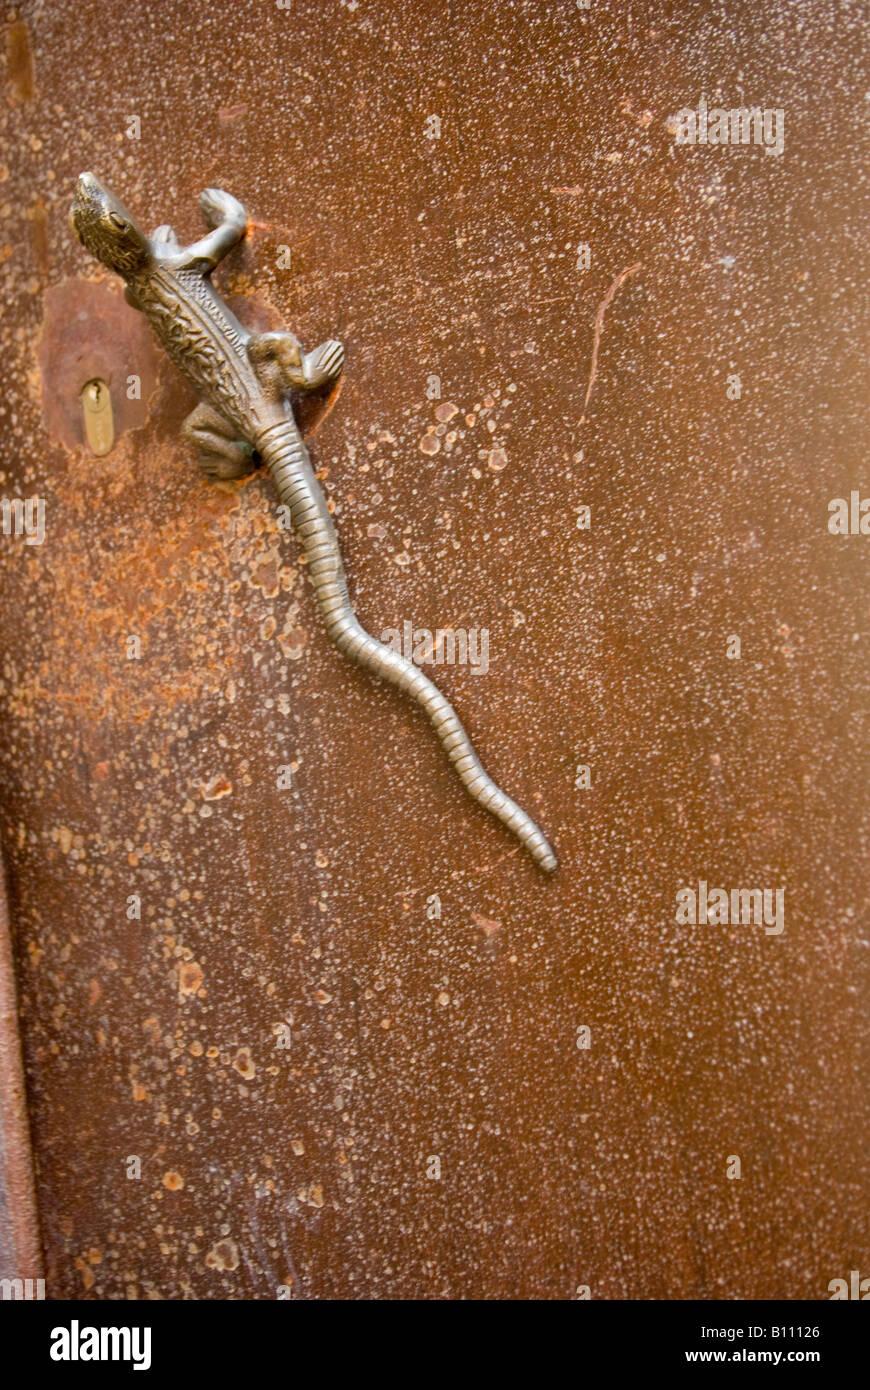 Lizard door handle, Girona, Spain Stock Photo, Royalty Free Image ...